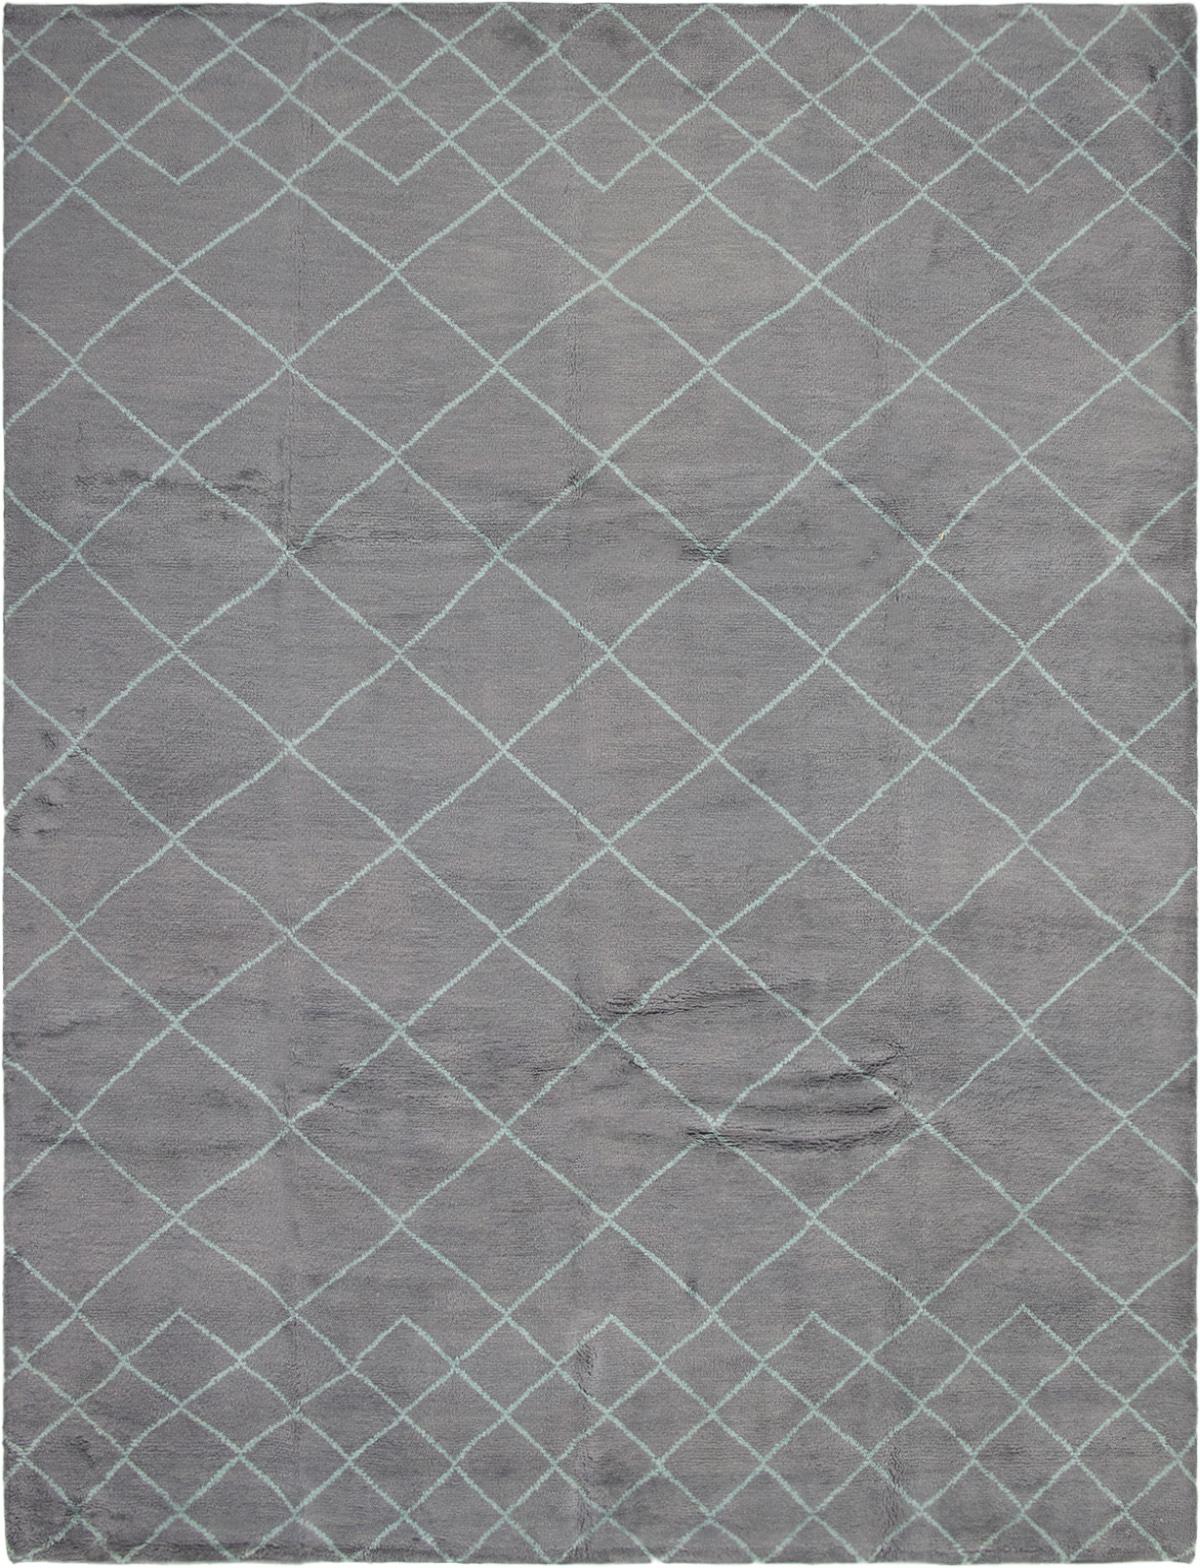 "Hand-knotted Arlequin Dark Grey Wool Rug 9'2"" x 12'0"" Size: 9'2"" x 12'0"""